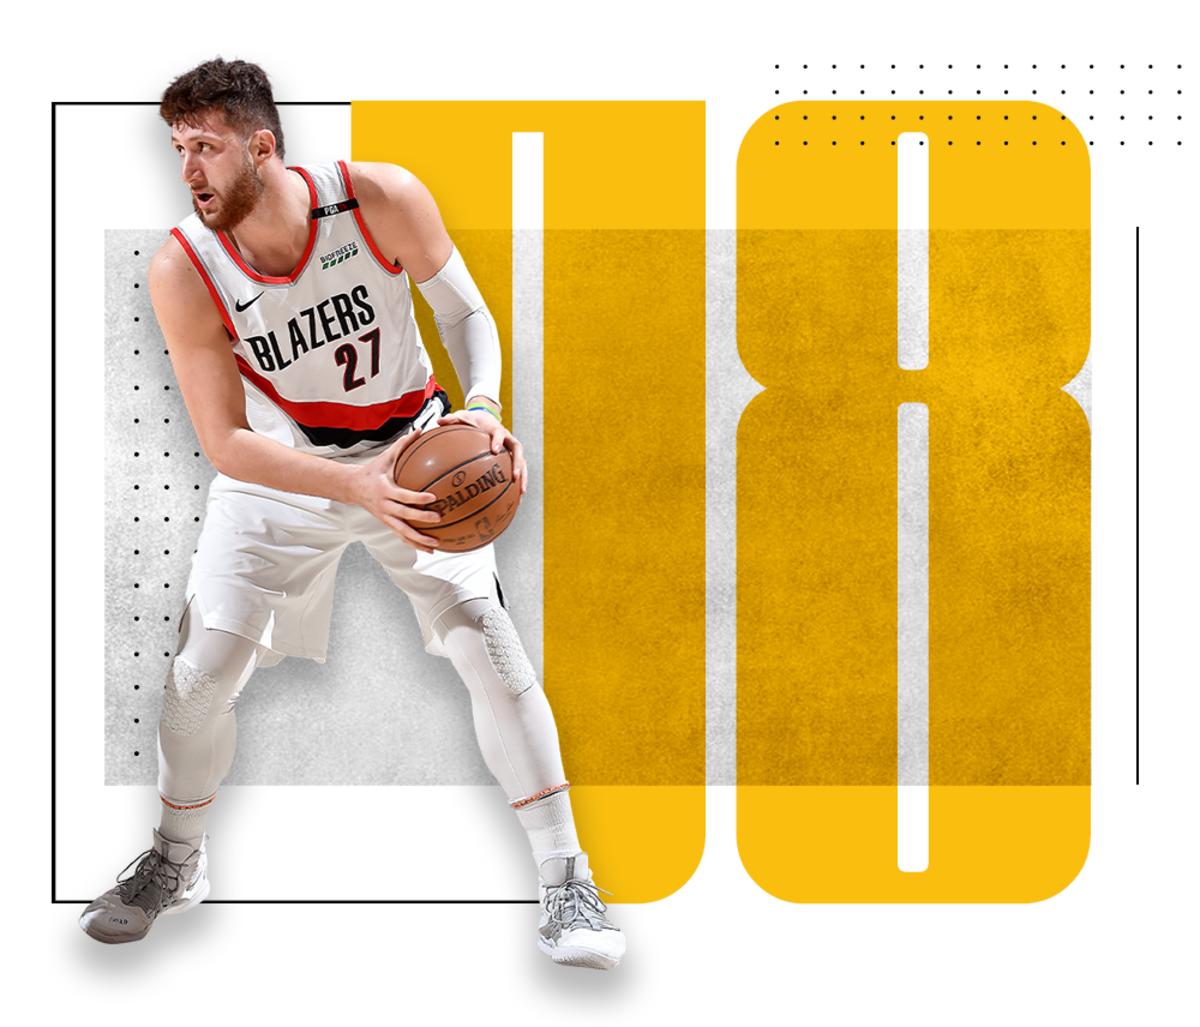 top-100-nba-players-2020-Jusuf-Nurkic.png